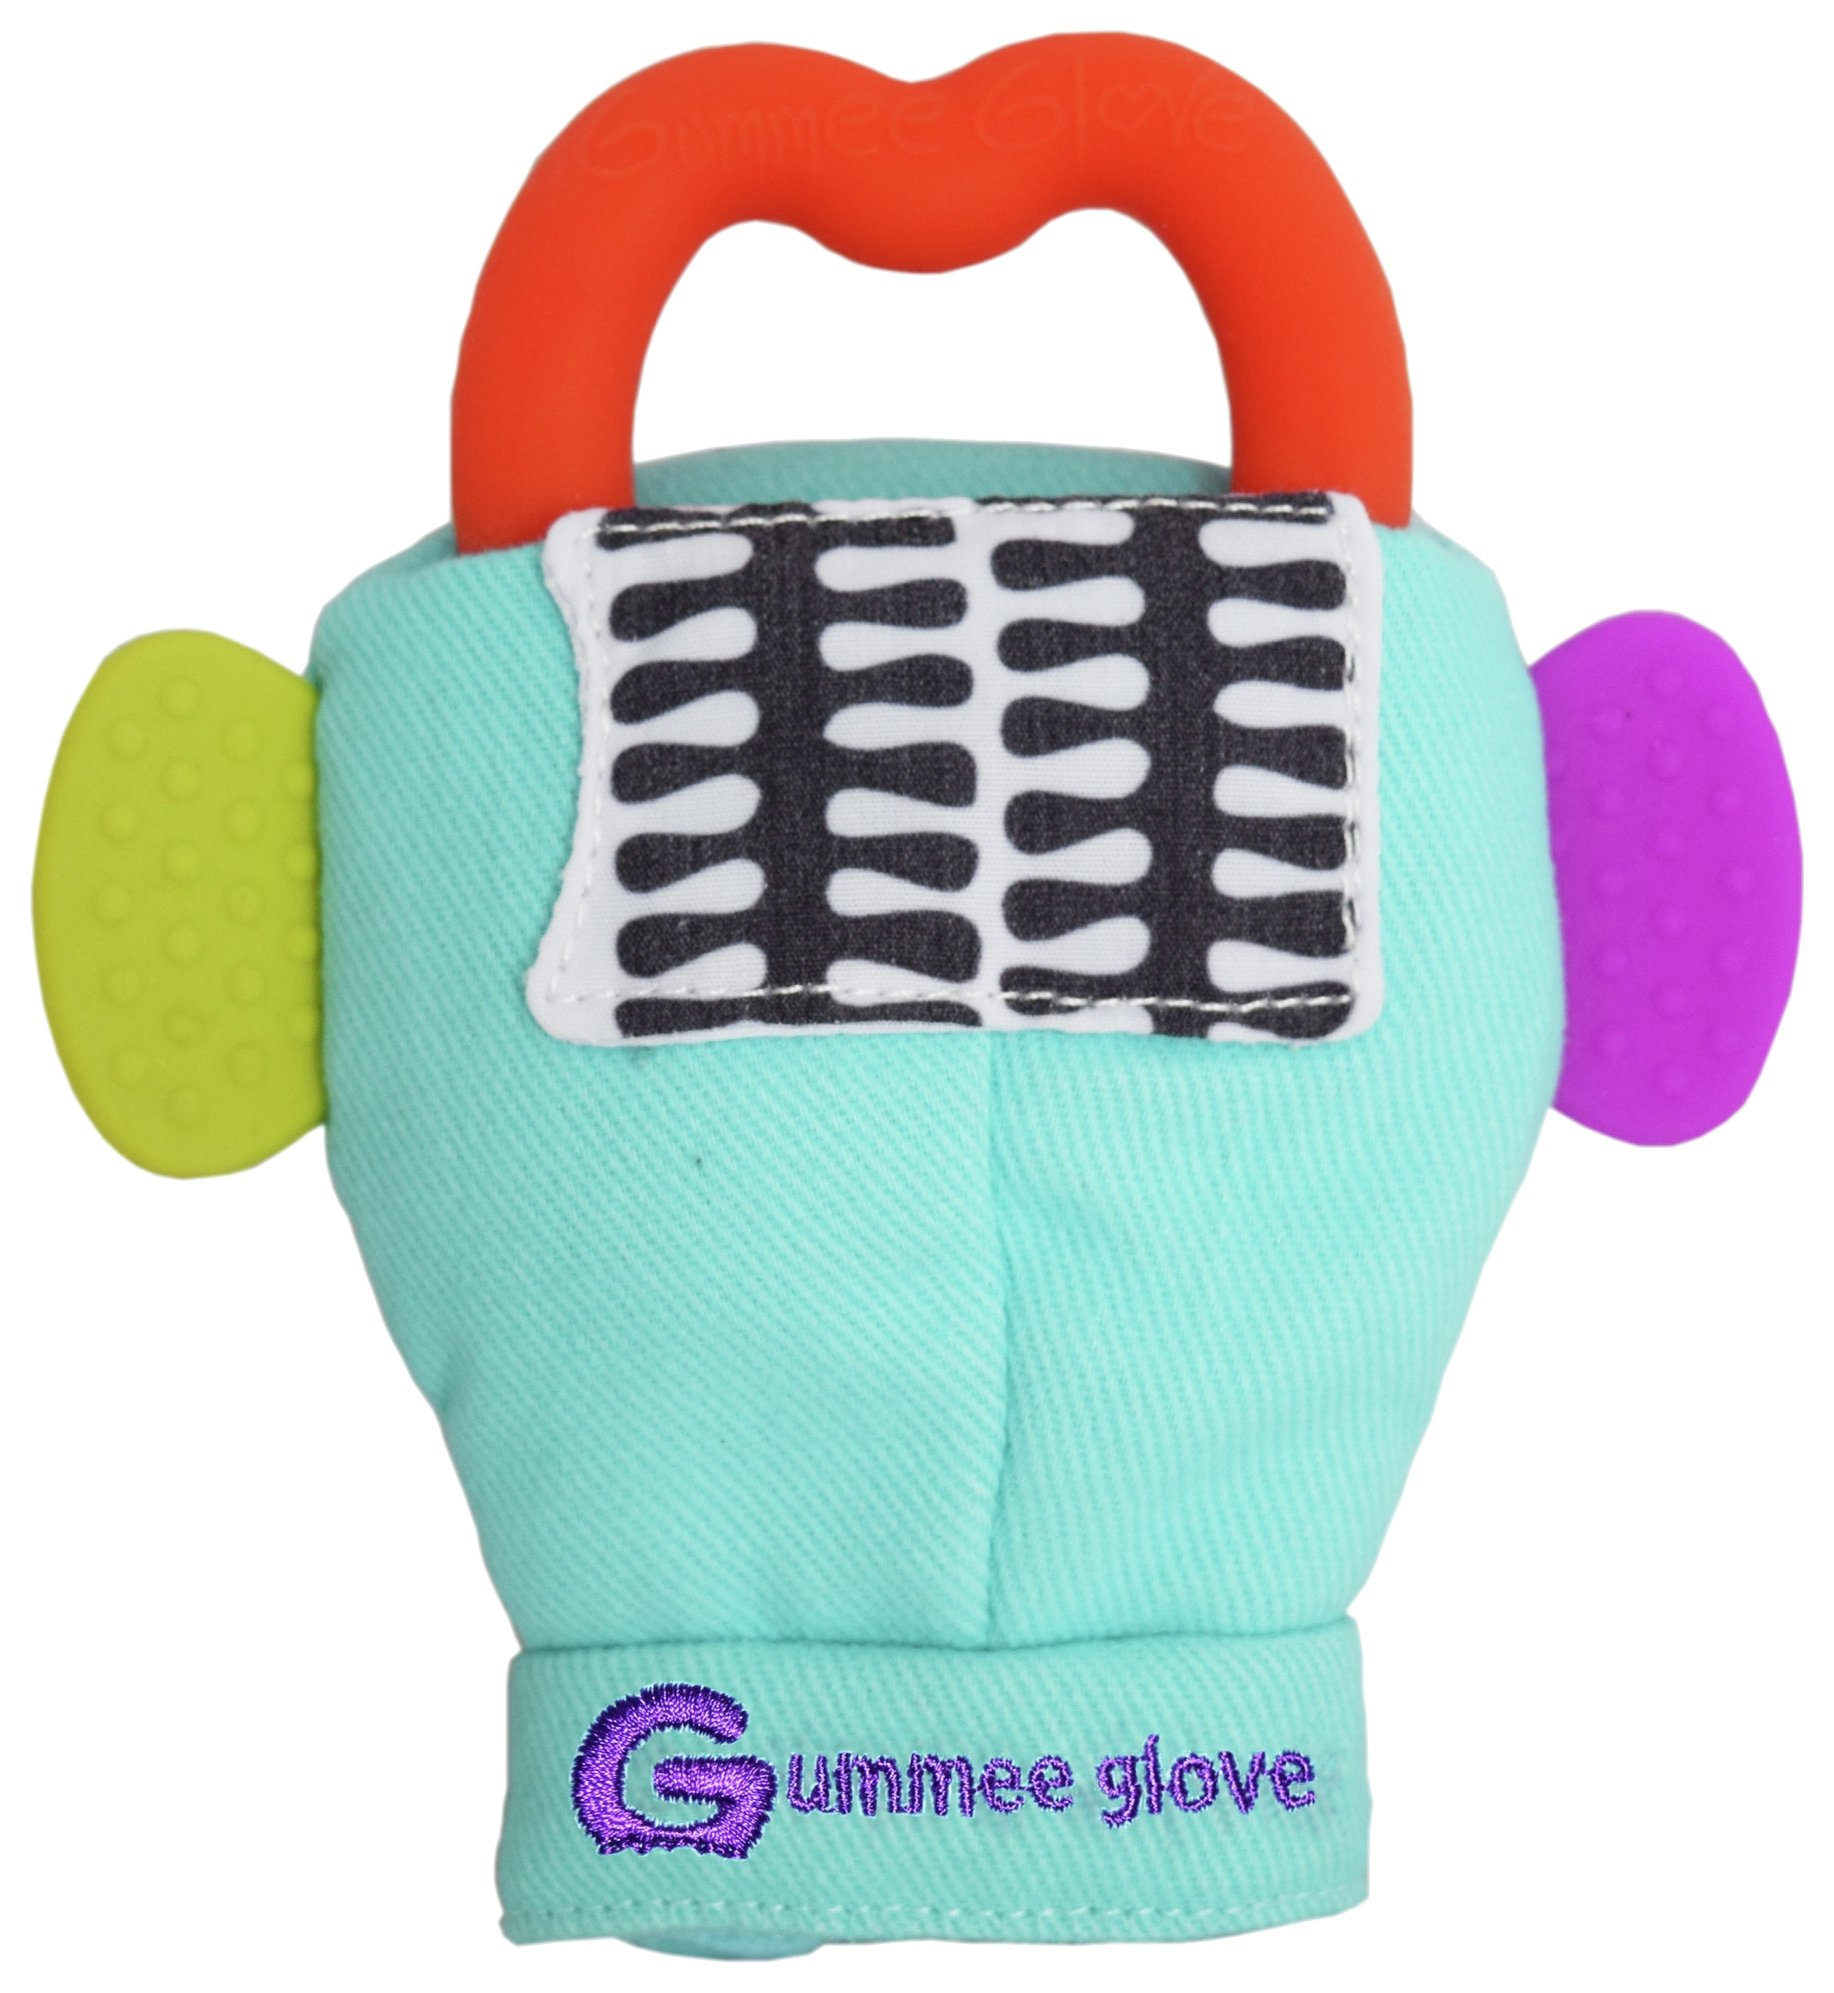 Gummee Glove Teething Mitten - Turquoise